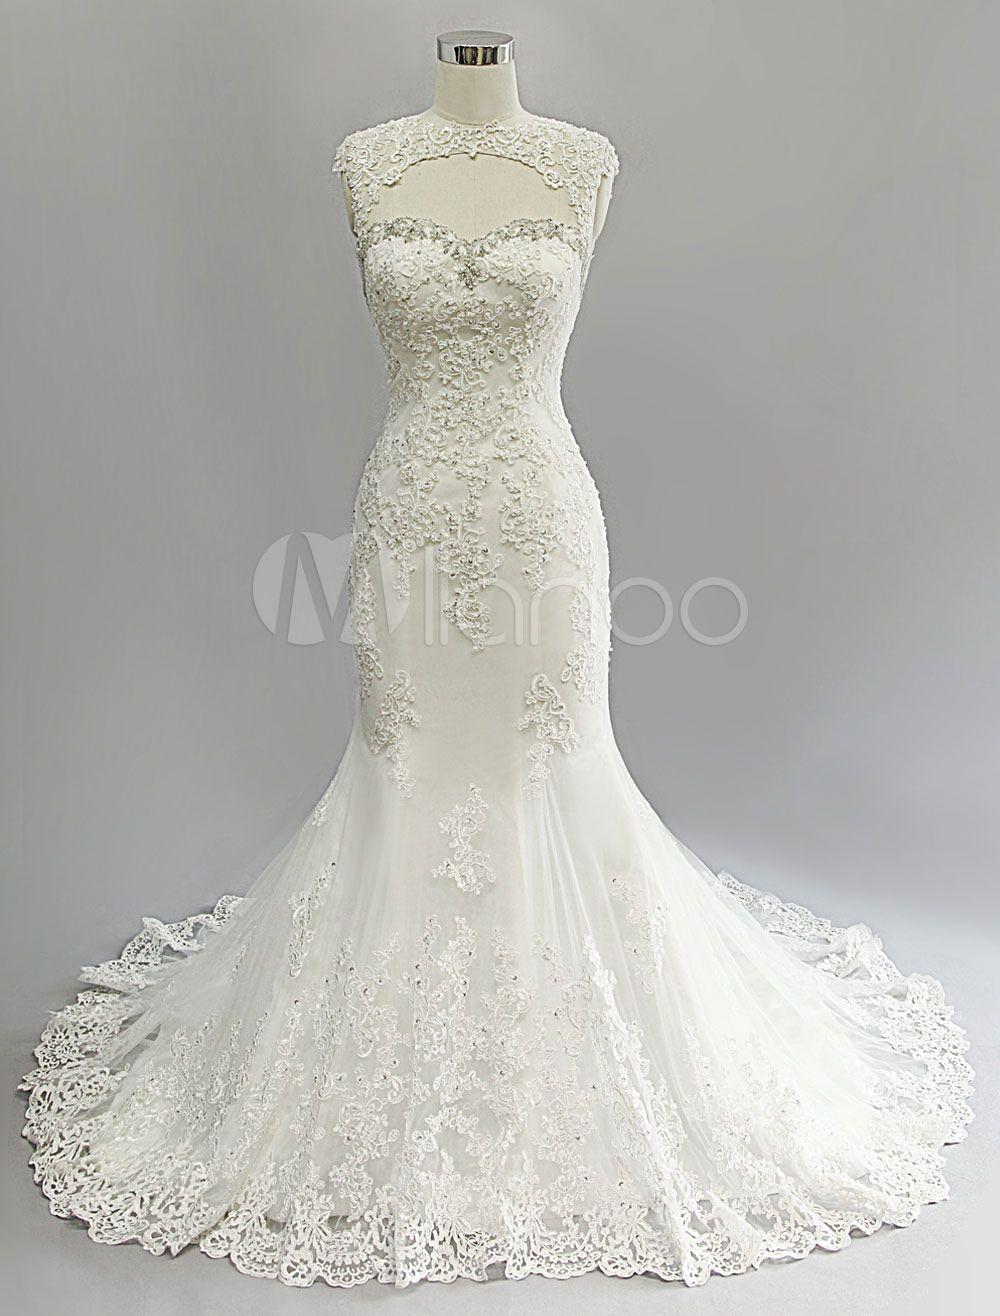 50s Wedding Dress Mermaid